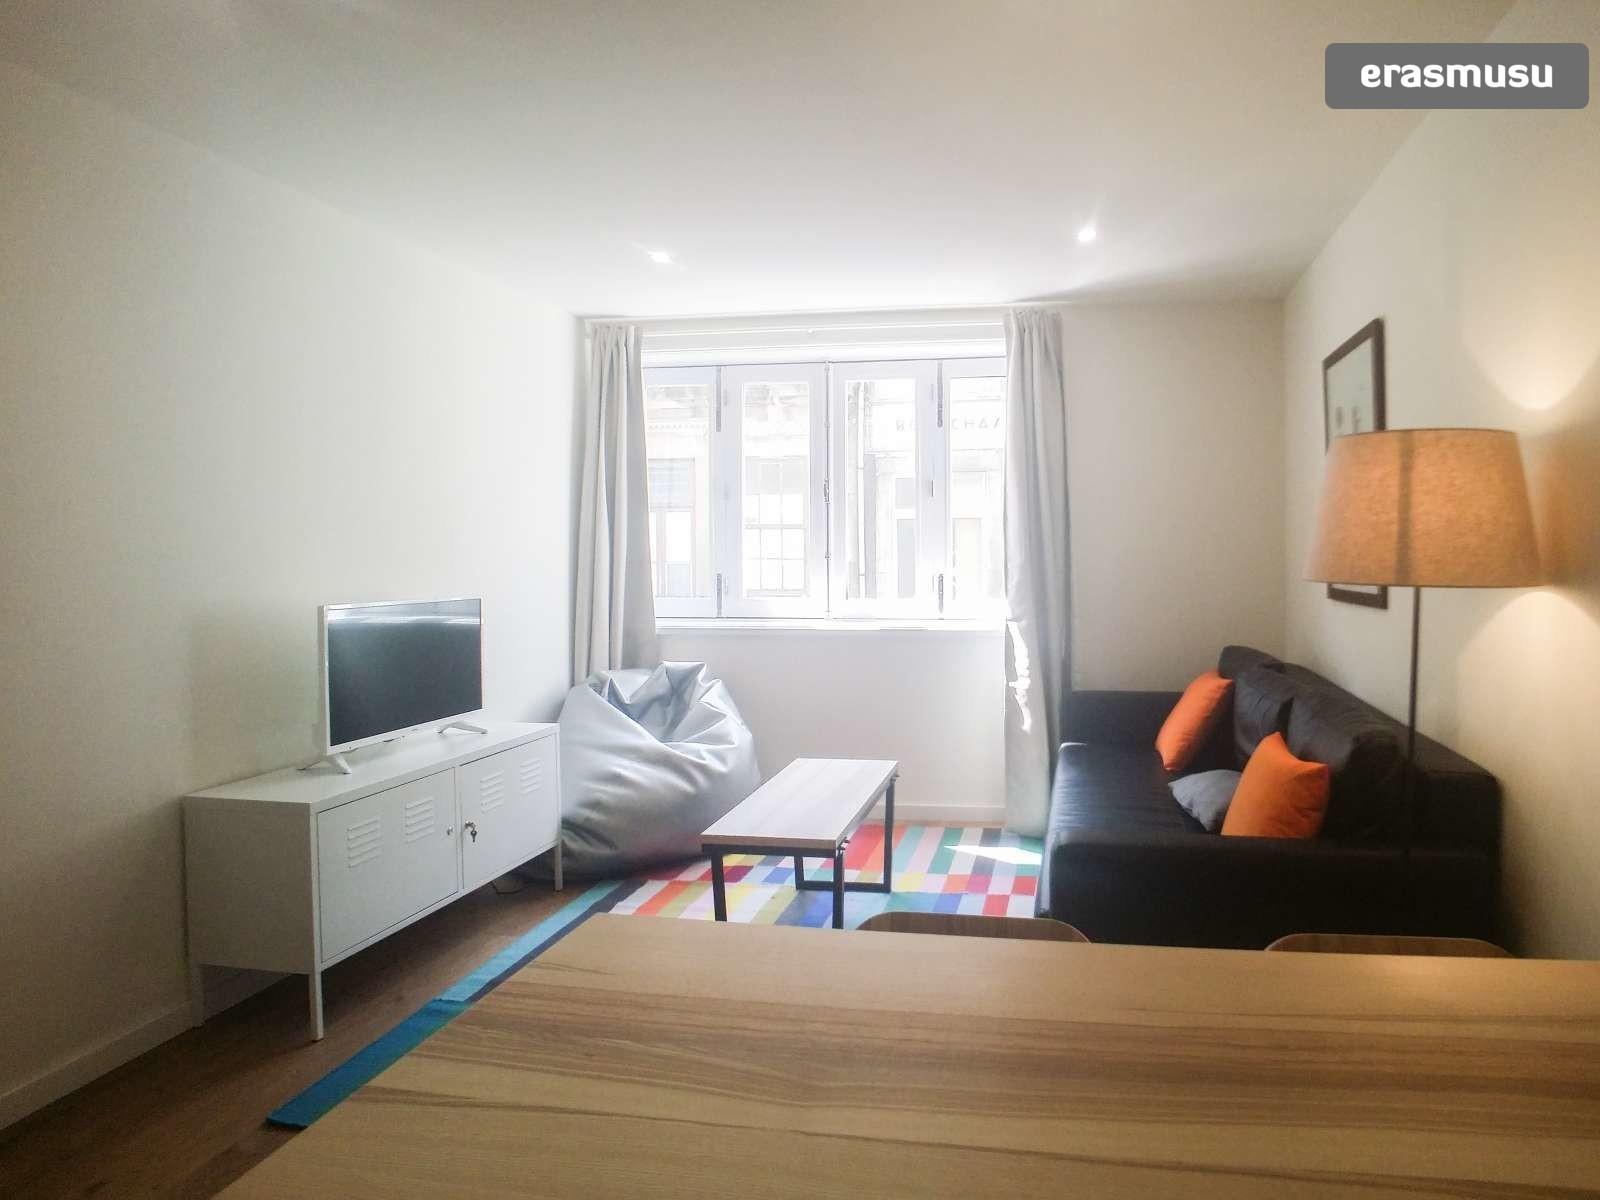 1-bedroom-apartment-rent-santo-ildefonso-cdcf72847b6b55978a63d54